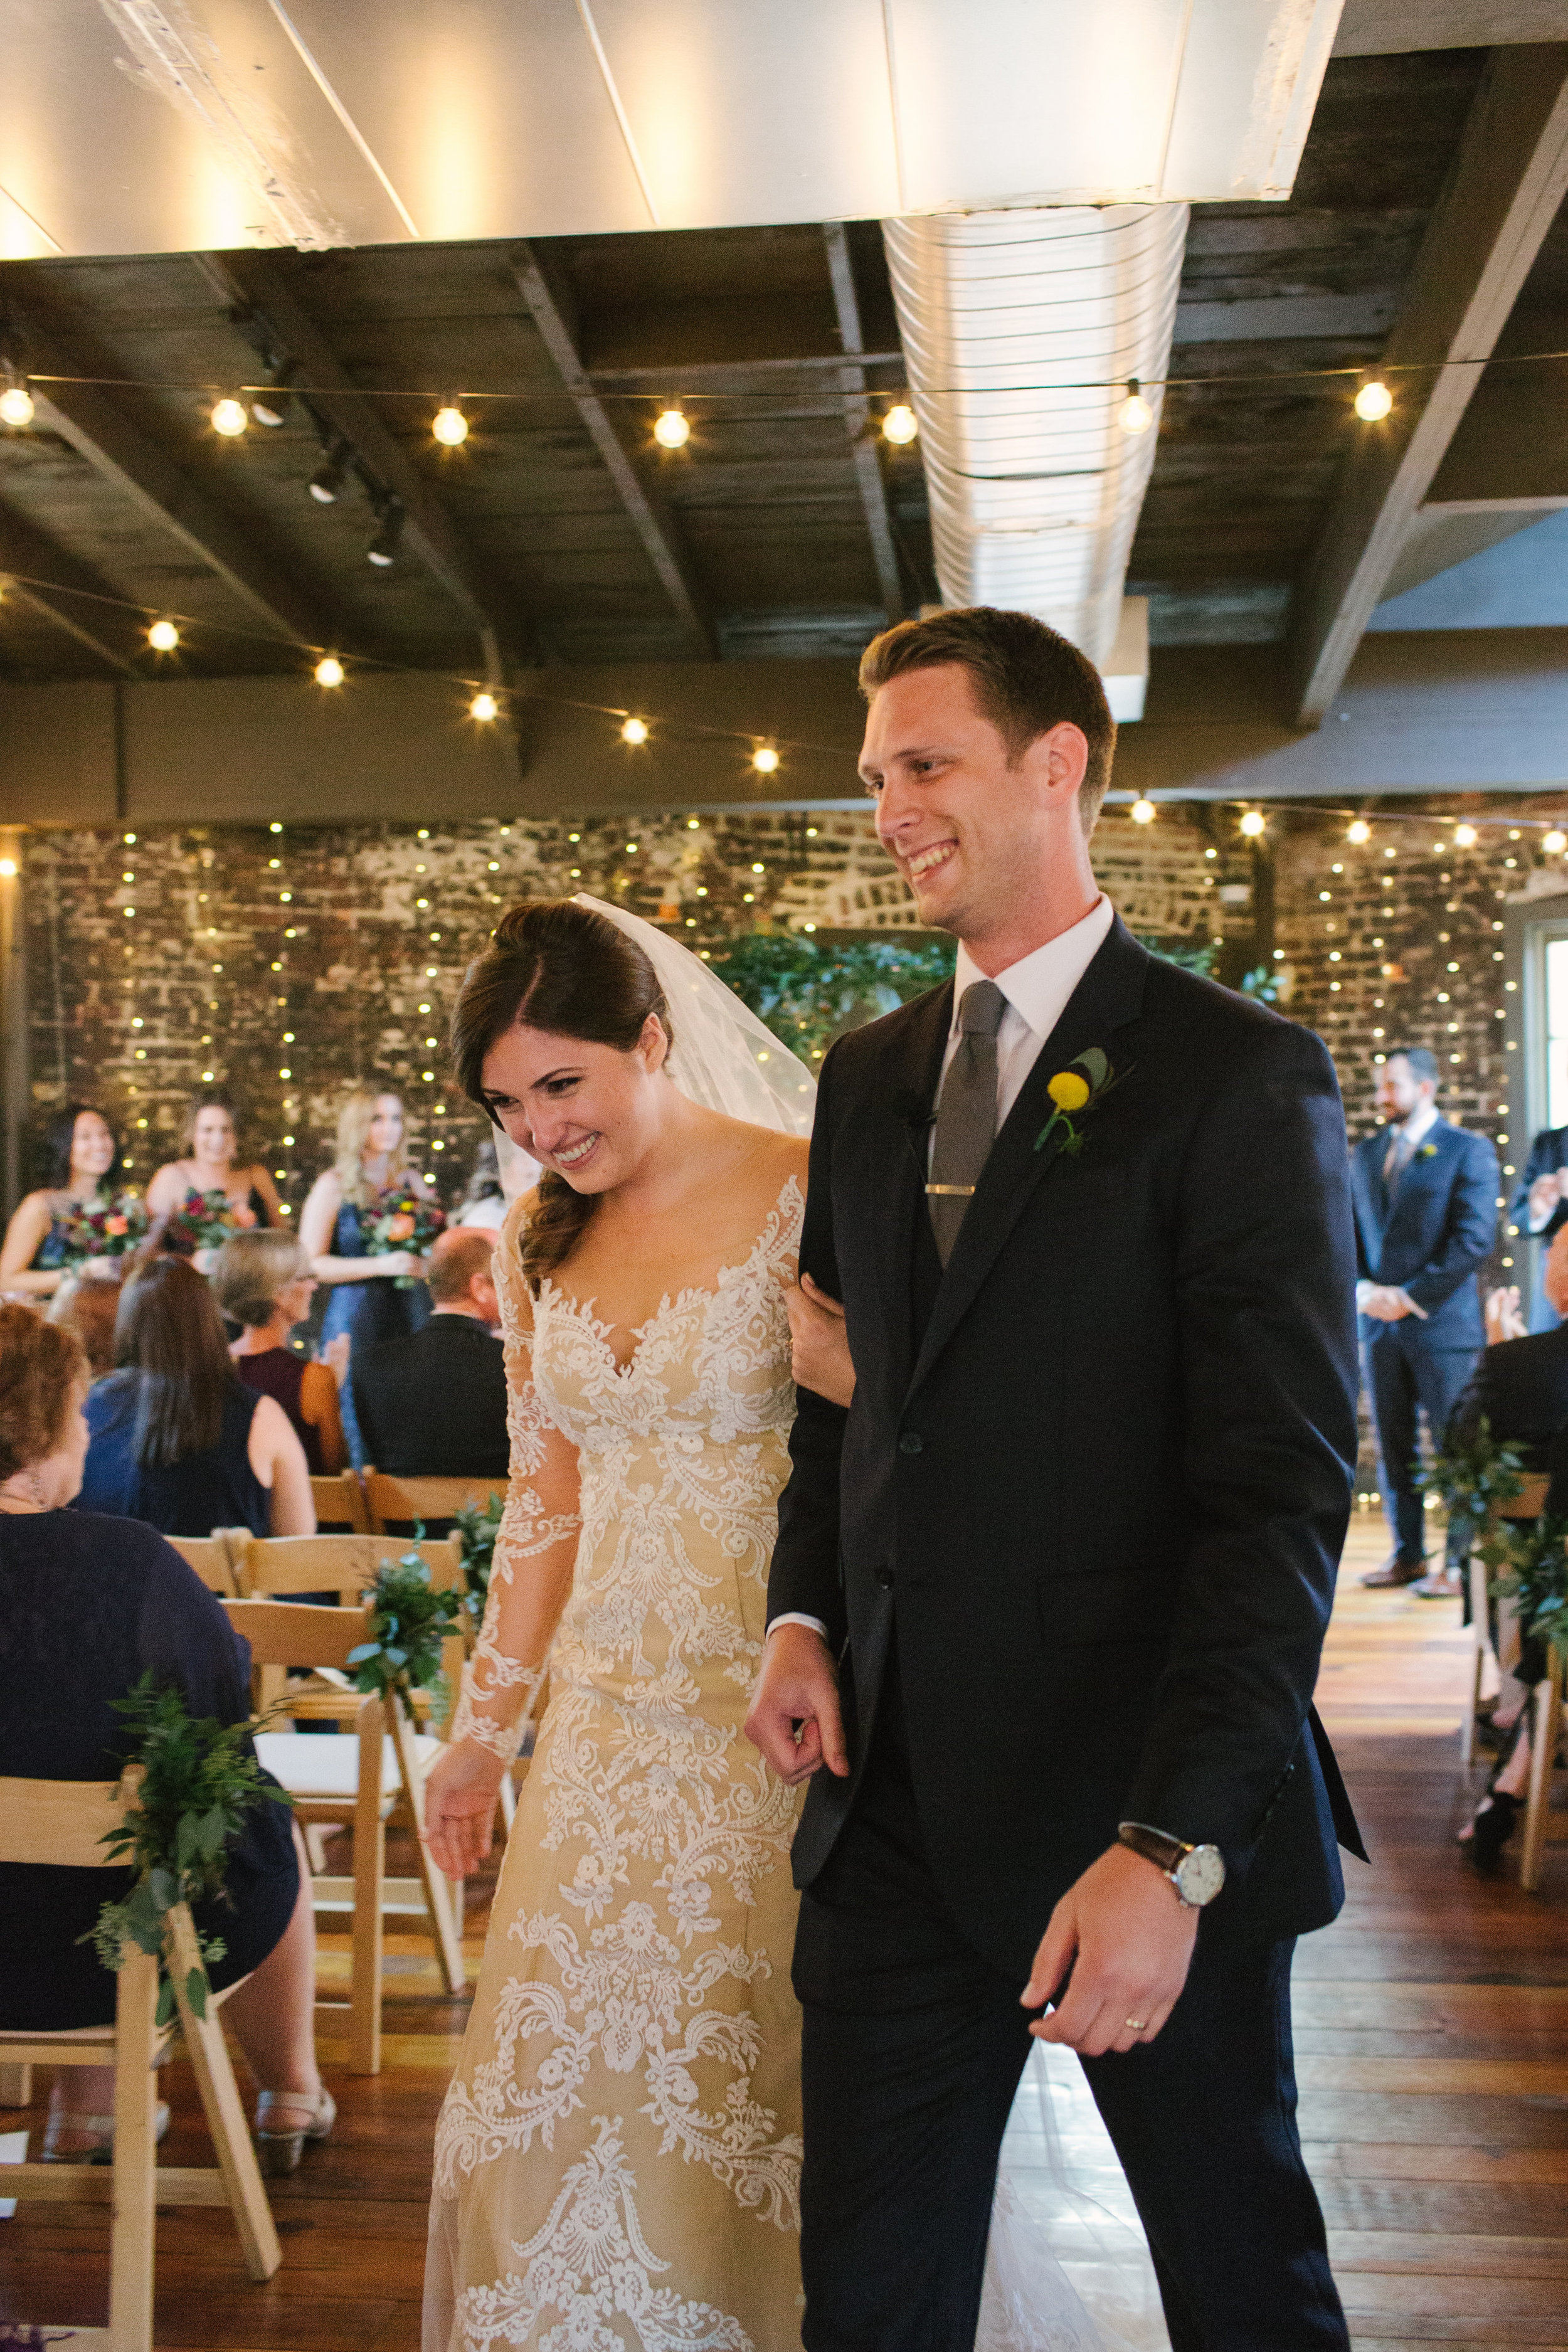 Dupon Circle Wedding | Washington DC Wedding Photography | Rebecca Wilcher Photography -10.jpg